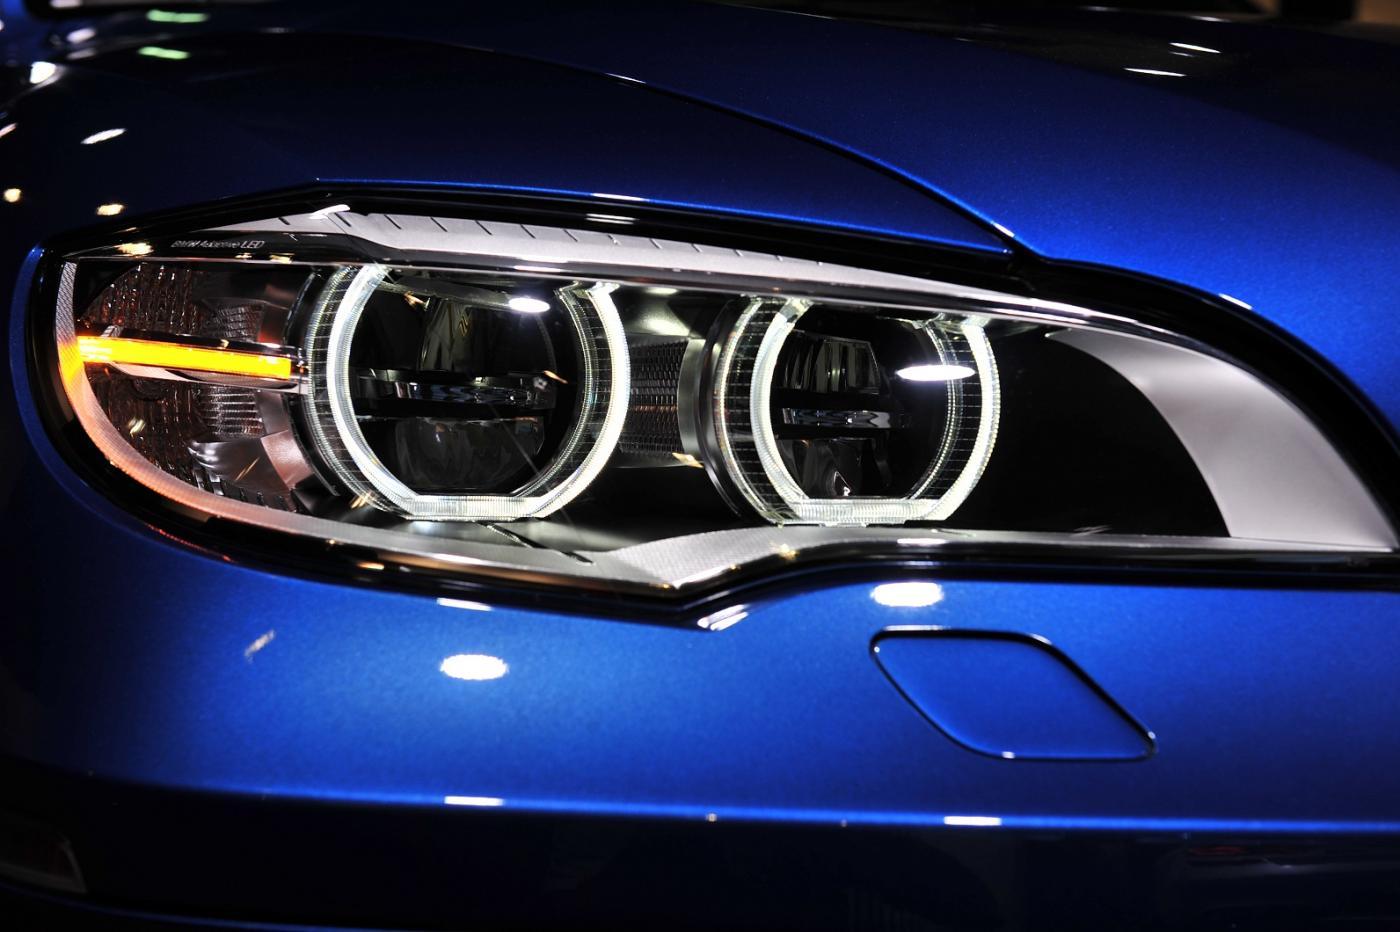 2013 X5m With Adaptive Led Headlight